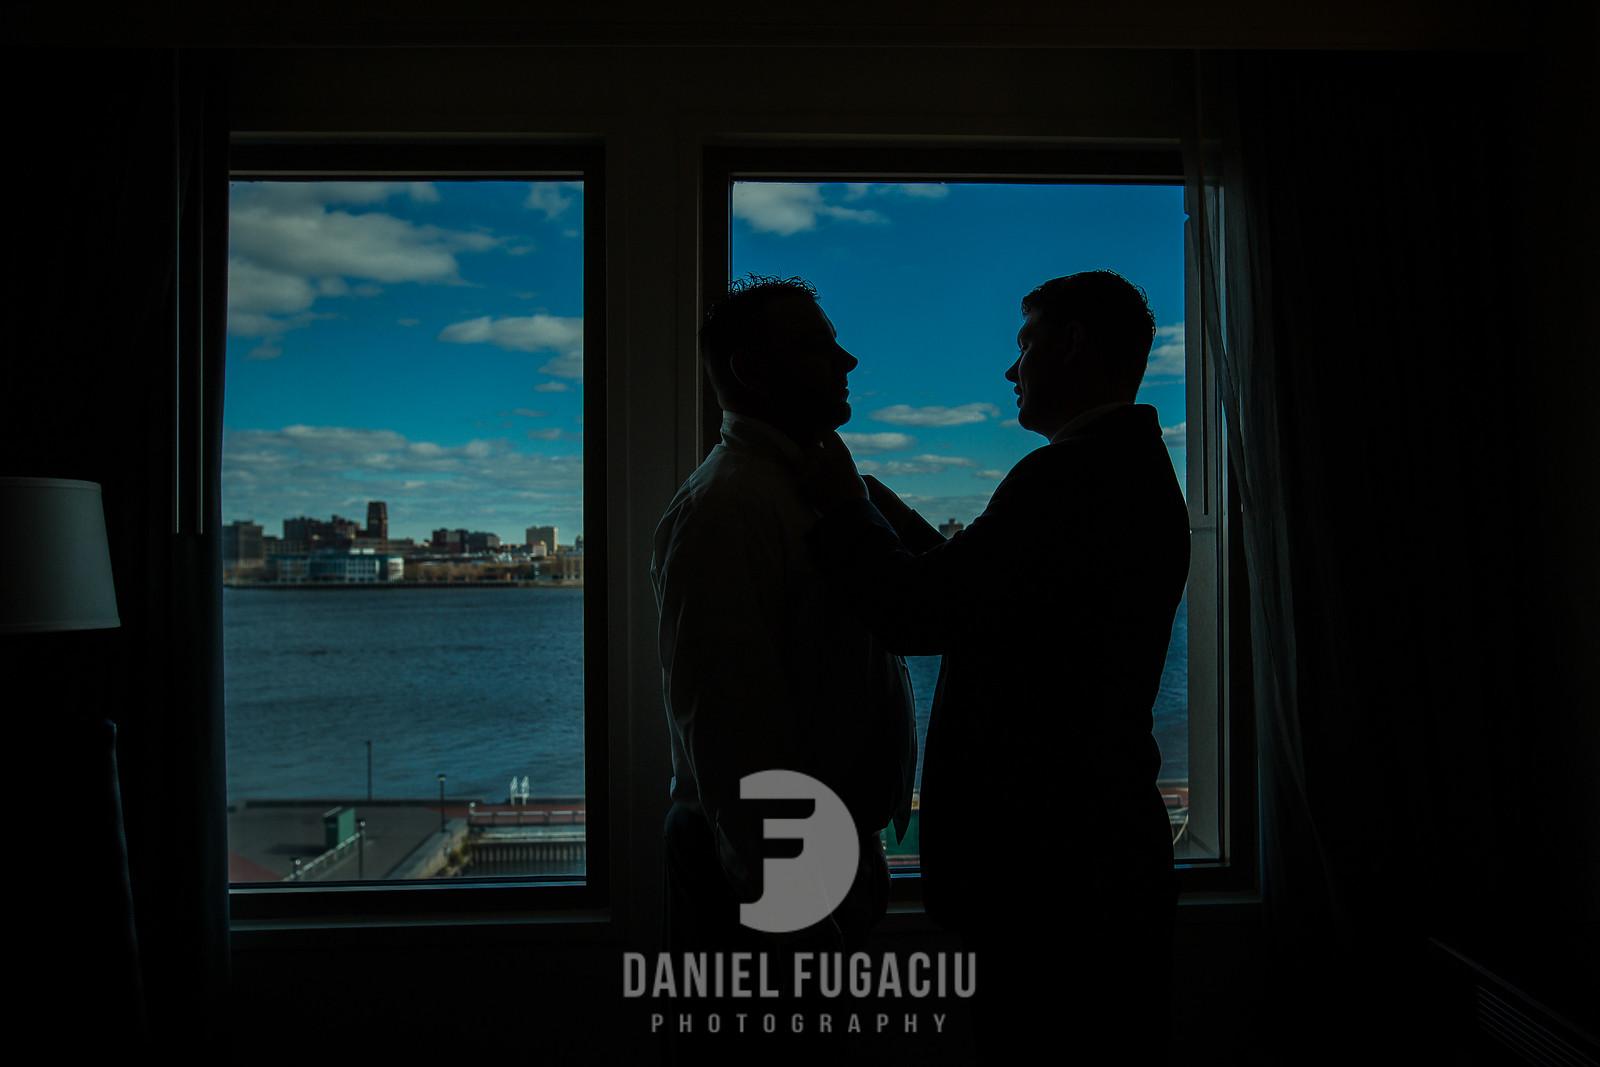 Daniel_Fugaciu_Photography_Liz_Rob_Real_Weddding_April_Lynn_Designs_The_Merion_New_Jersey_Brugundy_Gold_Wedding8